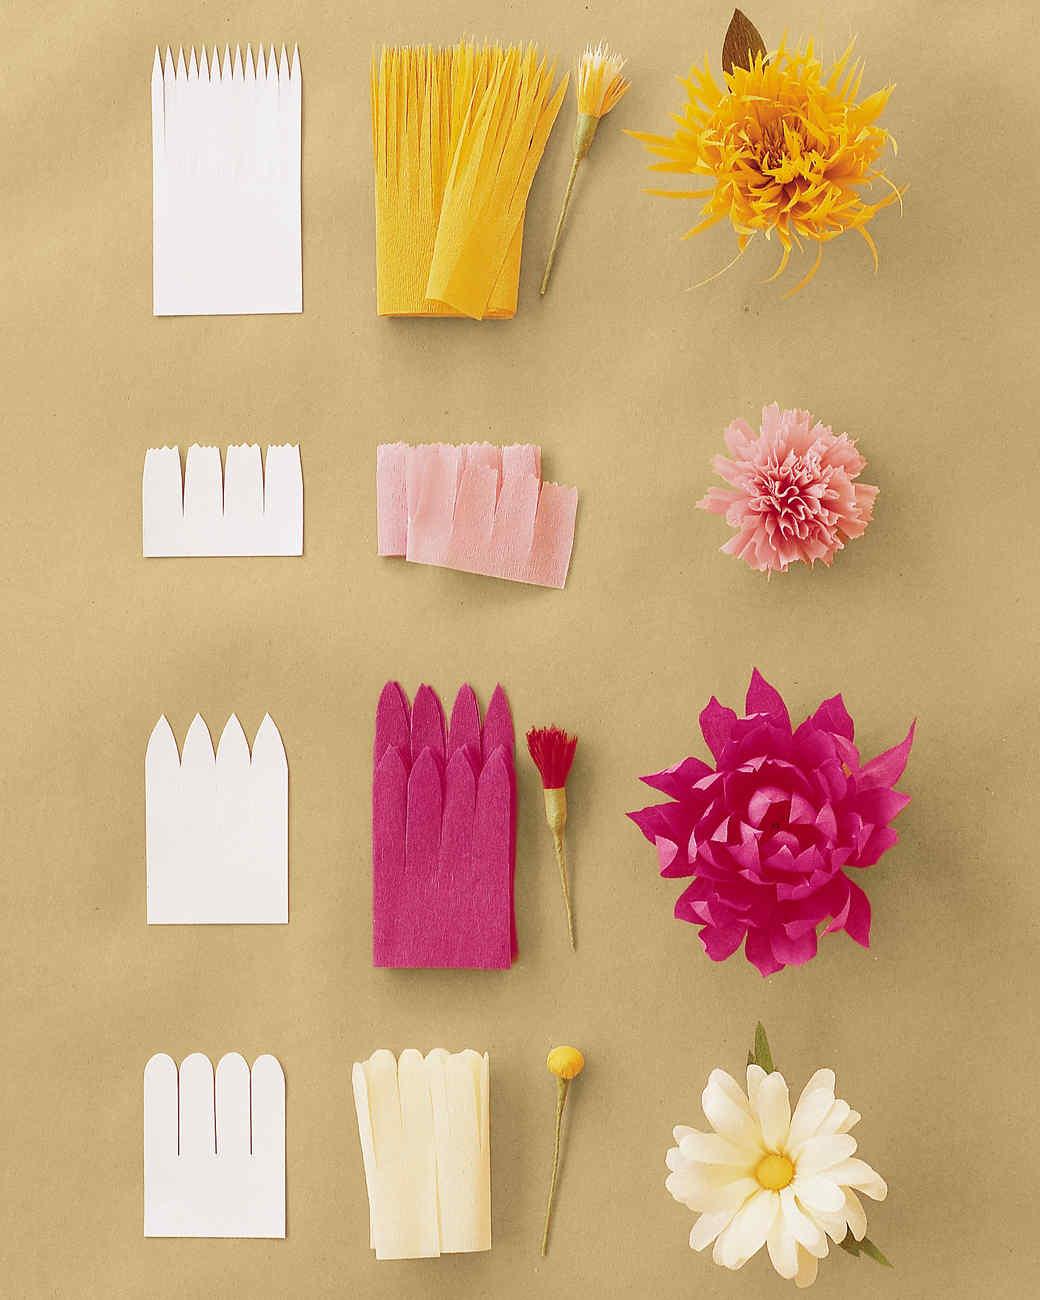 Crape Paper Flower Antalexpolicenciaslatam